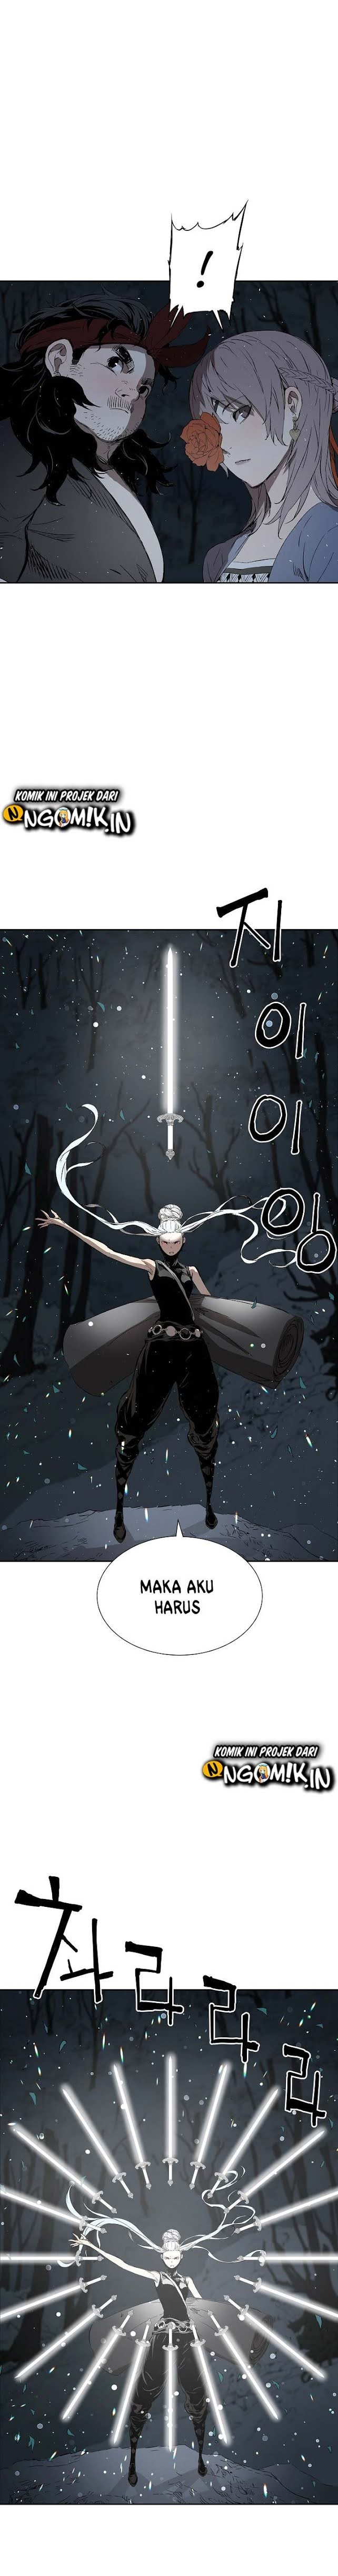 Sword Sheath's Child Chapter 38